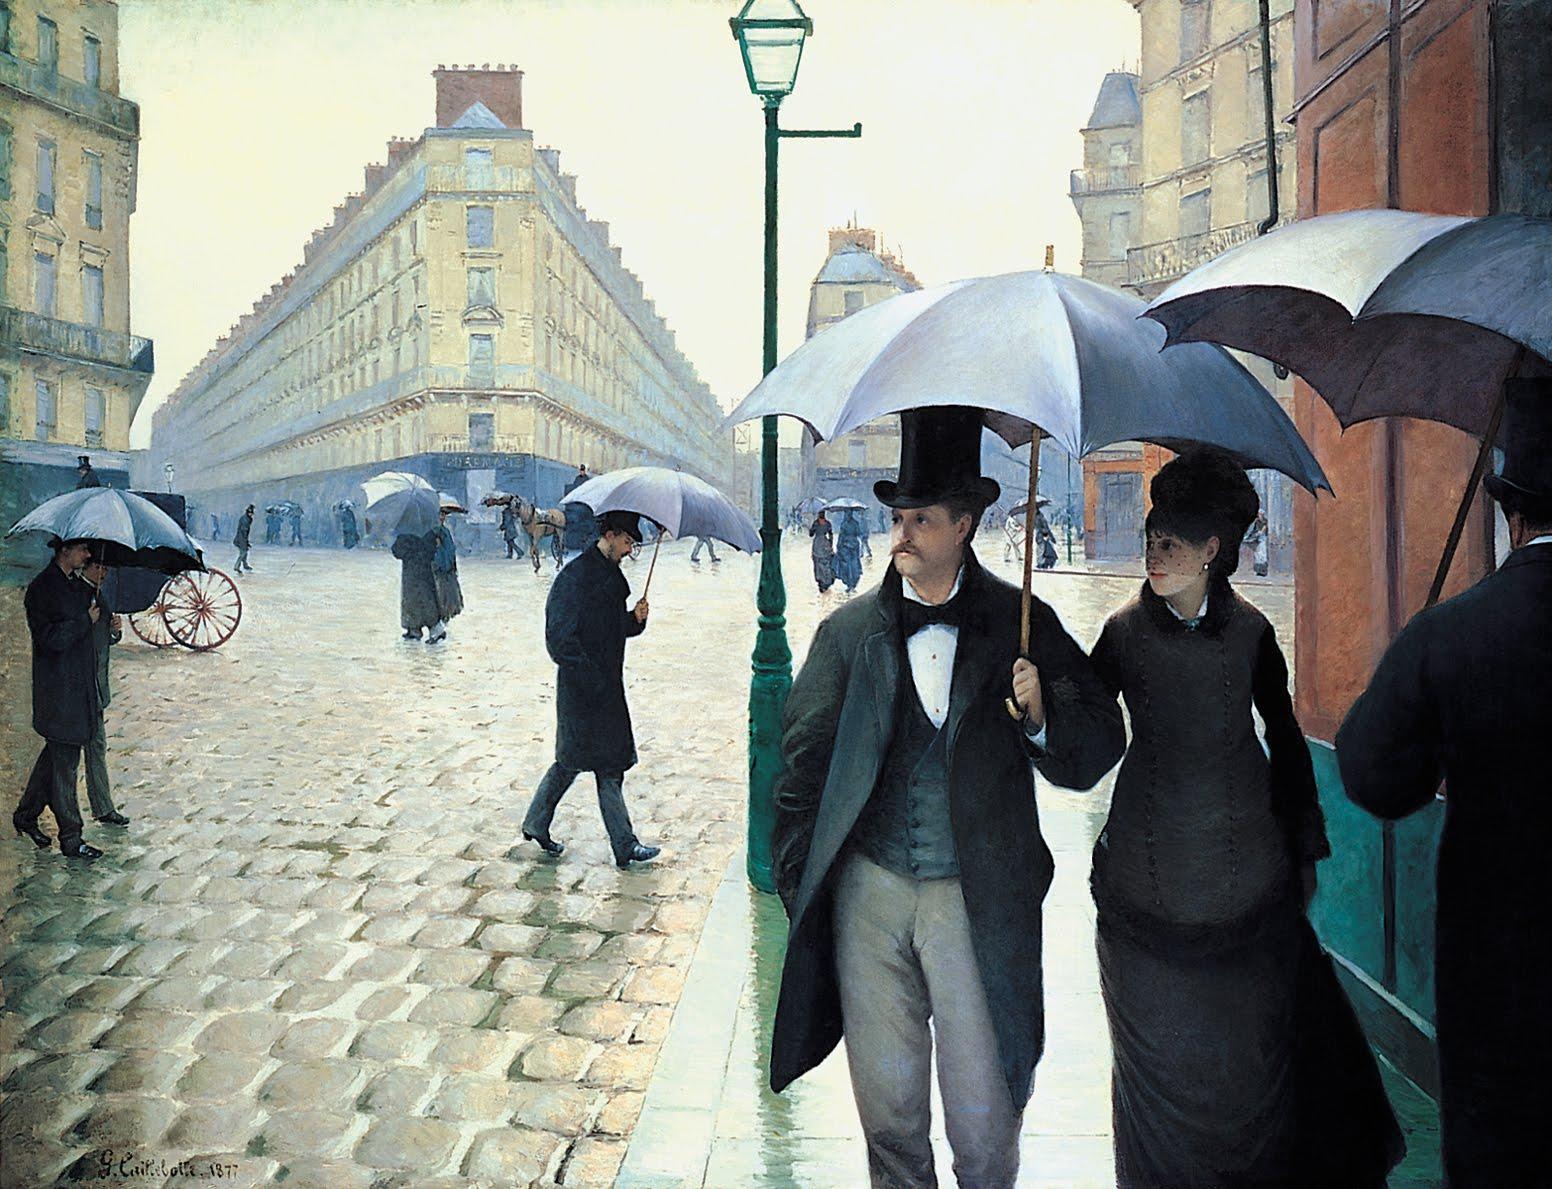 http://4.bp.blogspot.com/_y0KZso-pFEo/S7IcPGkHNKI/AAAAAAAAd9o/6ahwBIJp4vE/s1600/1caillebotte-paris-rainy.jpg